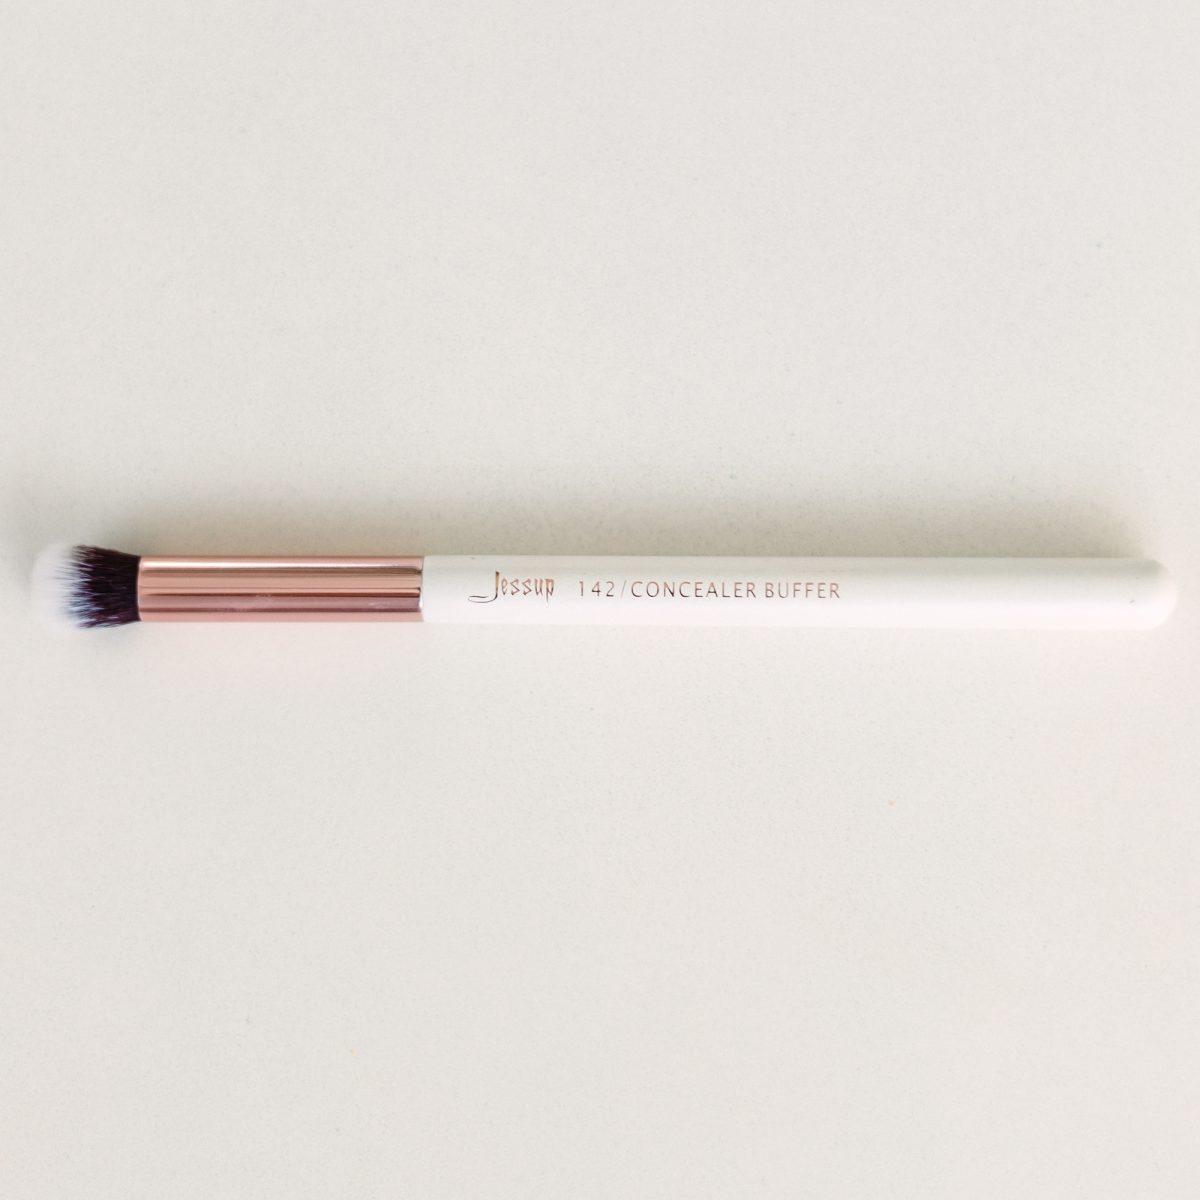 Makeup Brushes Guide - Jessup 142 Concealer Buffer